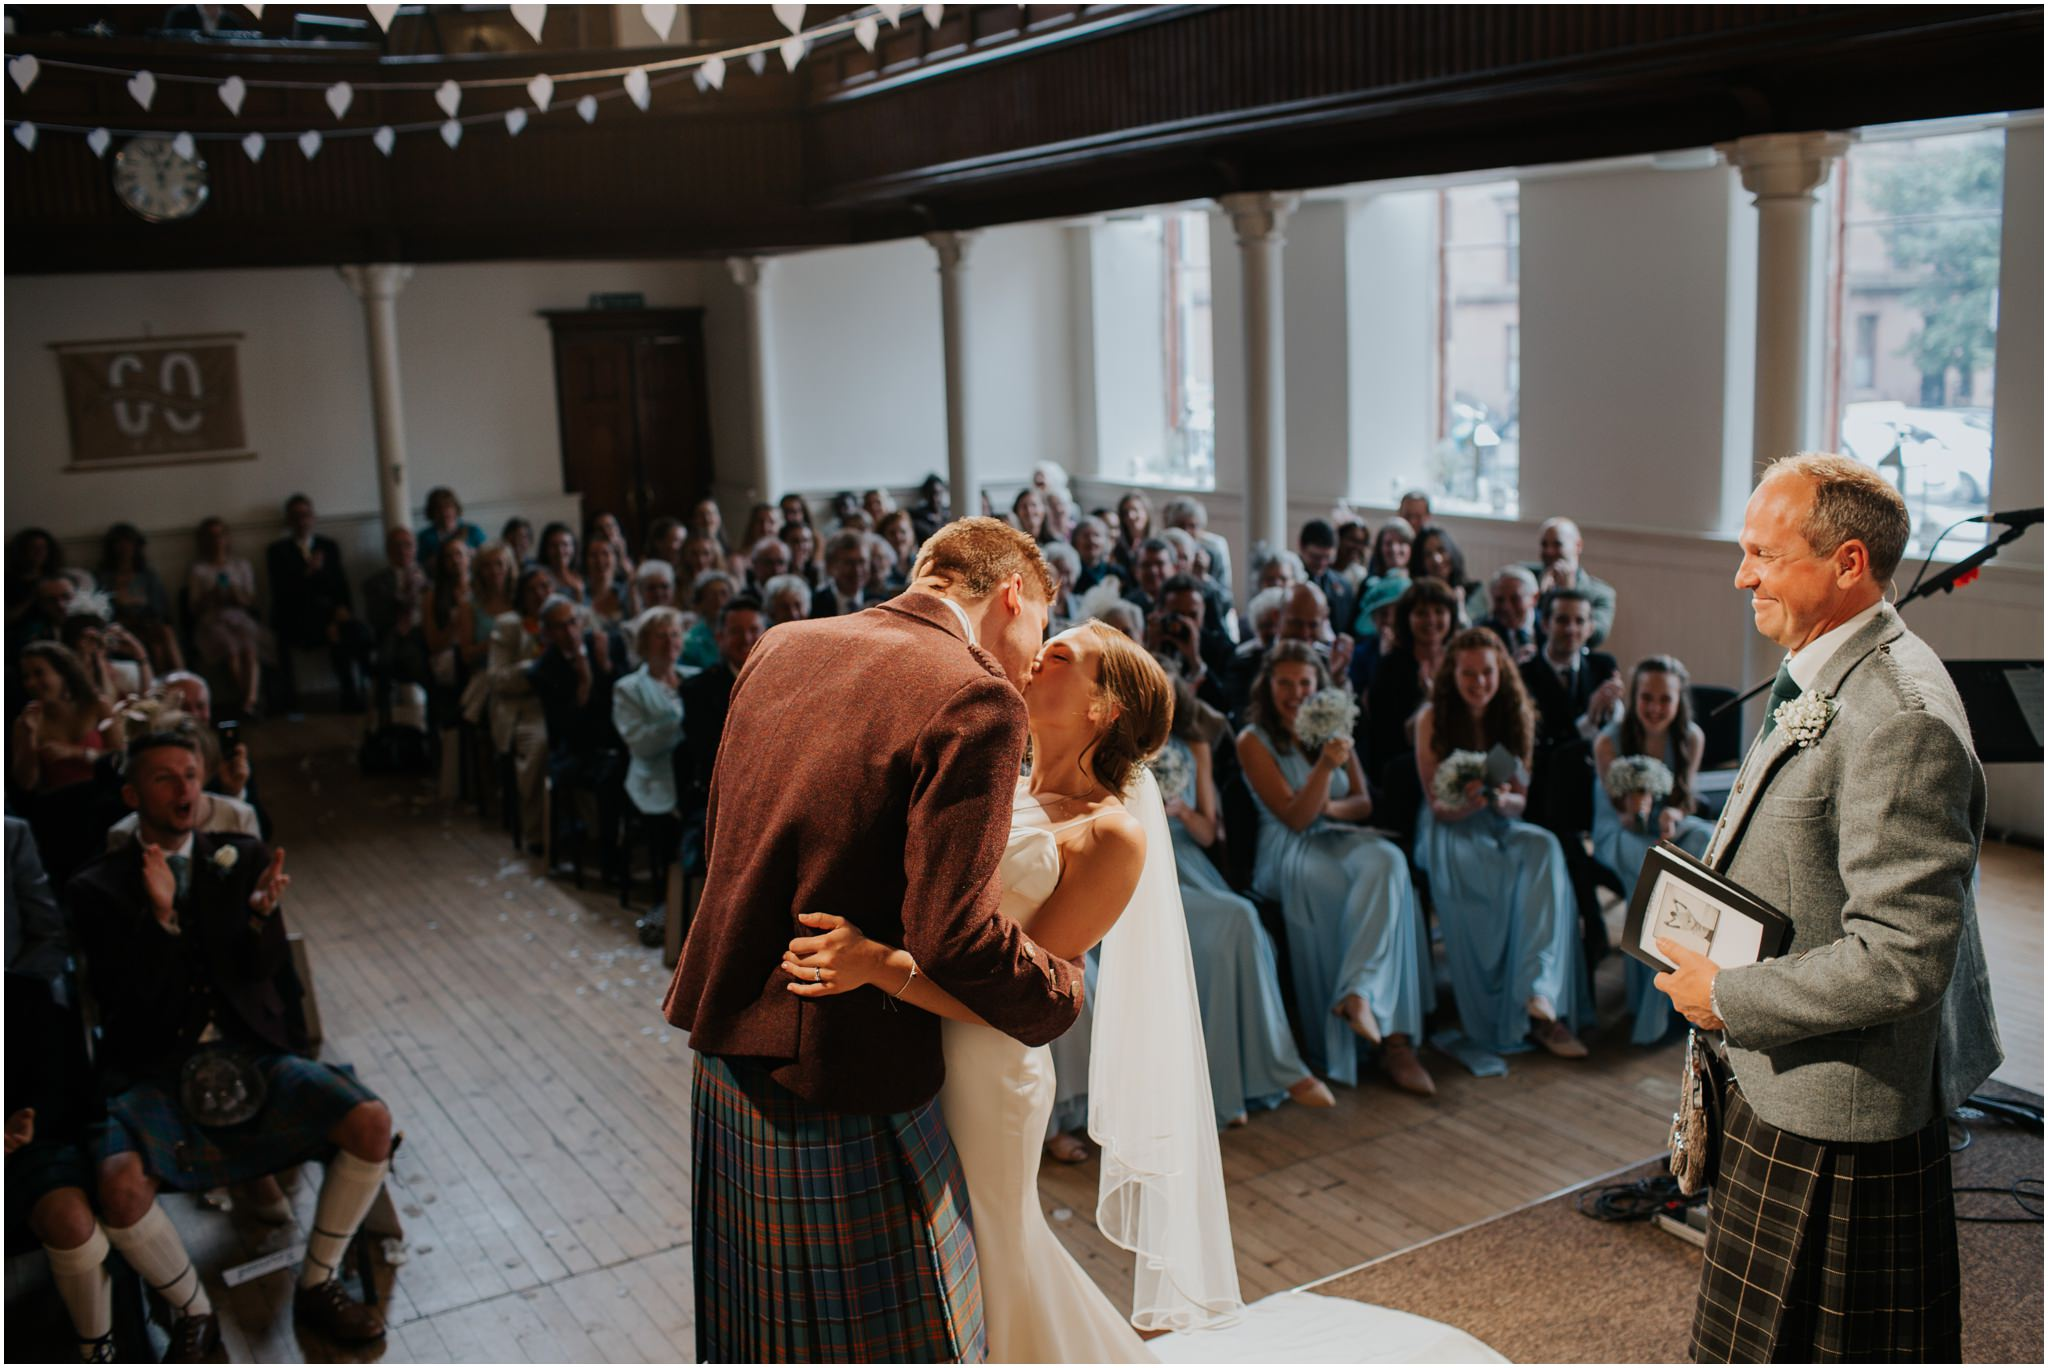 Photography 78 - Glasgow Wedding Photographer - Jordan & Abi - The Waterside Hotel, West Kilbride_0063.jpg